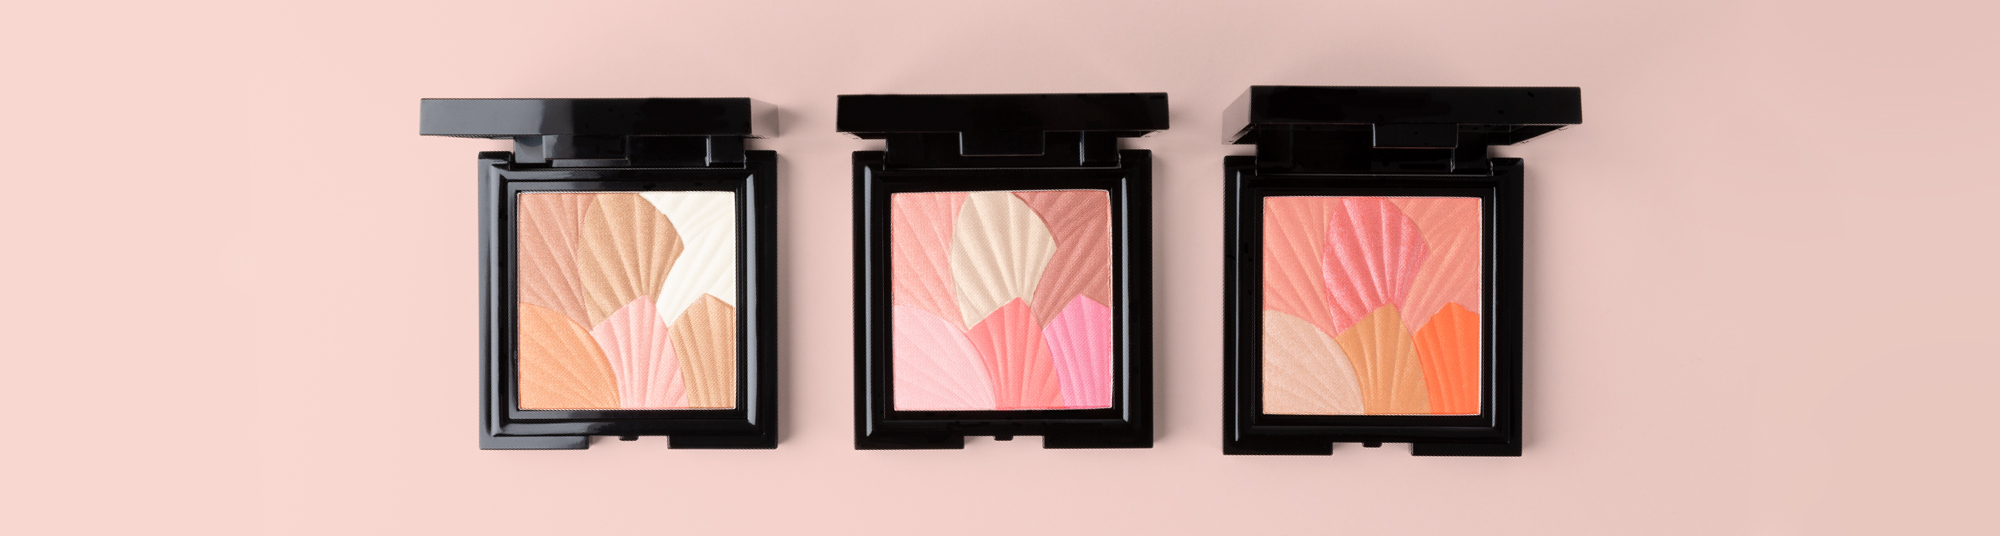 Mii Cosmetics Blush Category